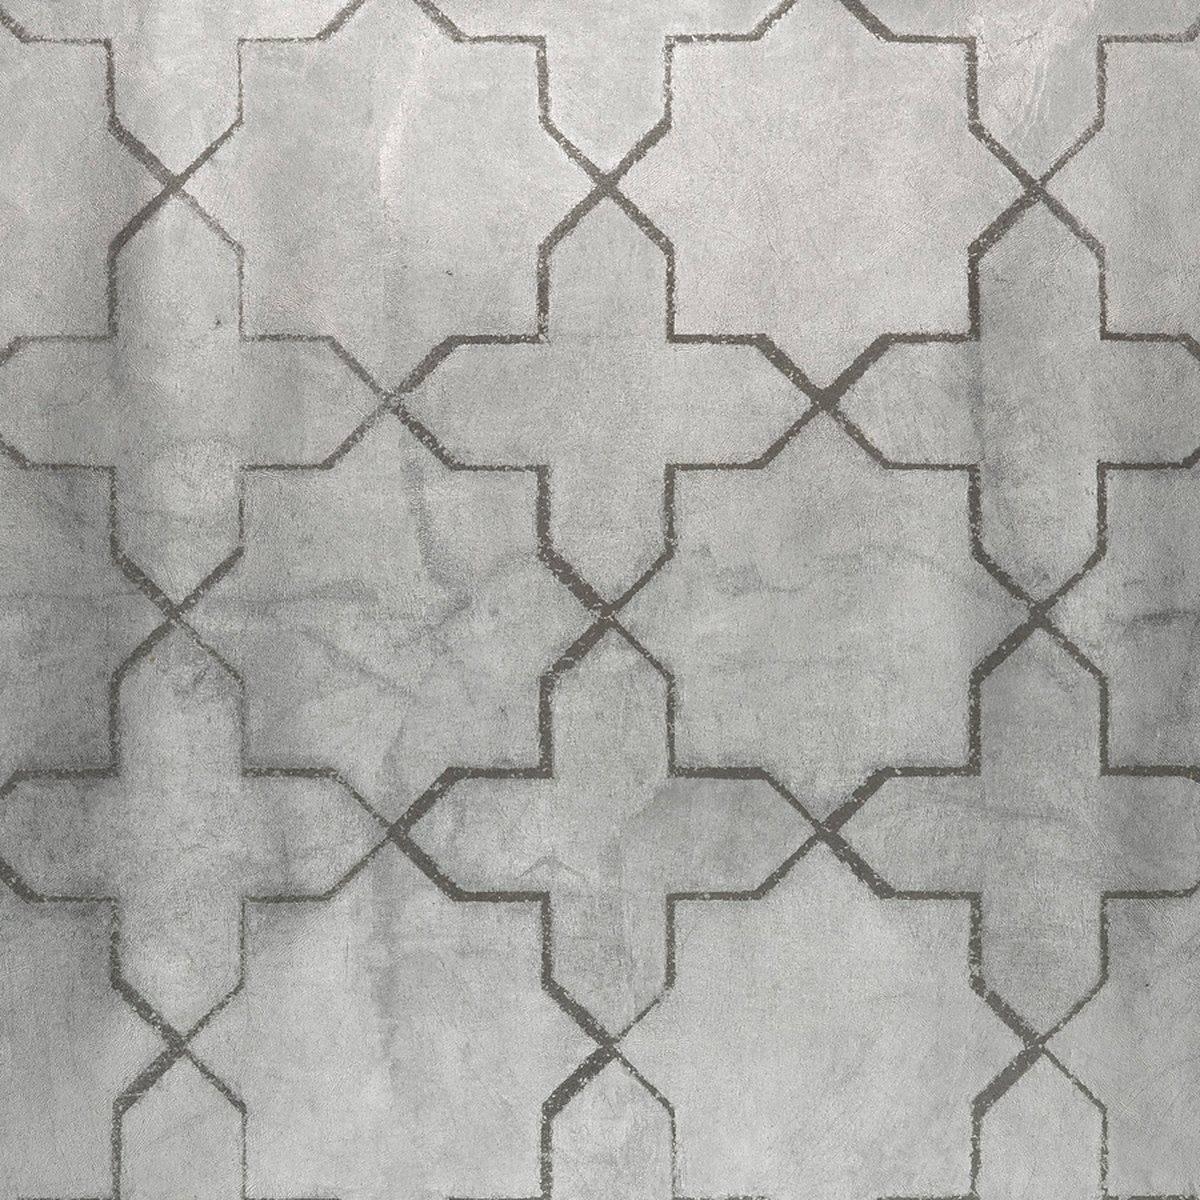 Phillip Jeffries Marrakesh Metal Platinum Palace Wallpaper GV236 1200x1200